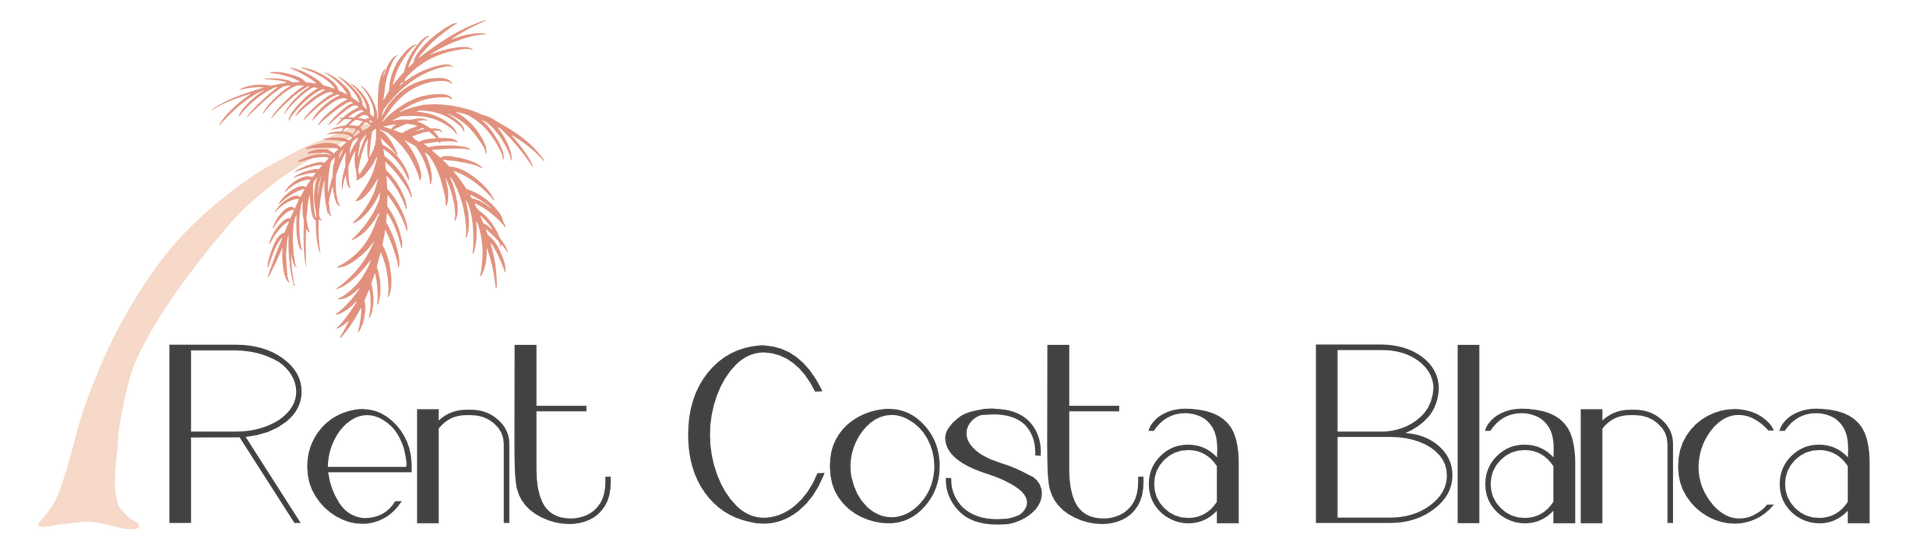 Rent Costa Blanca v5 Dark.png